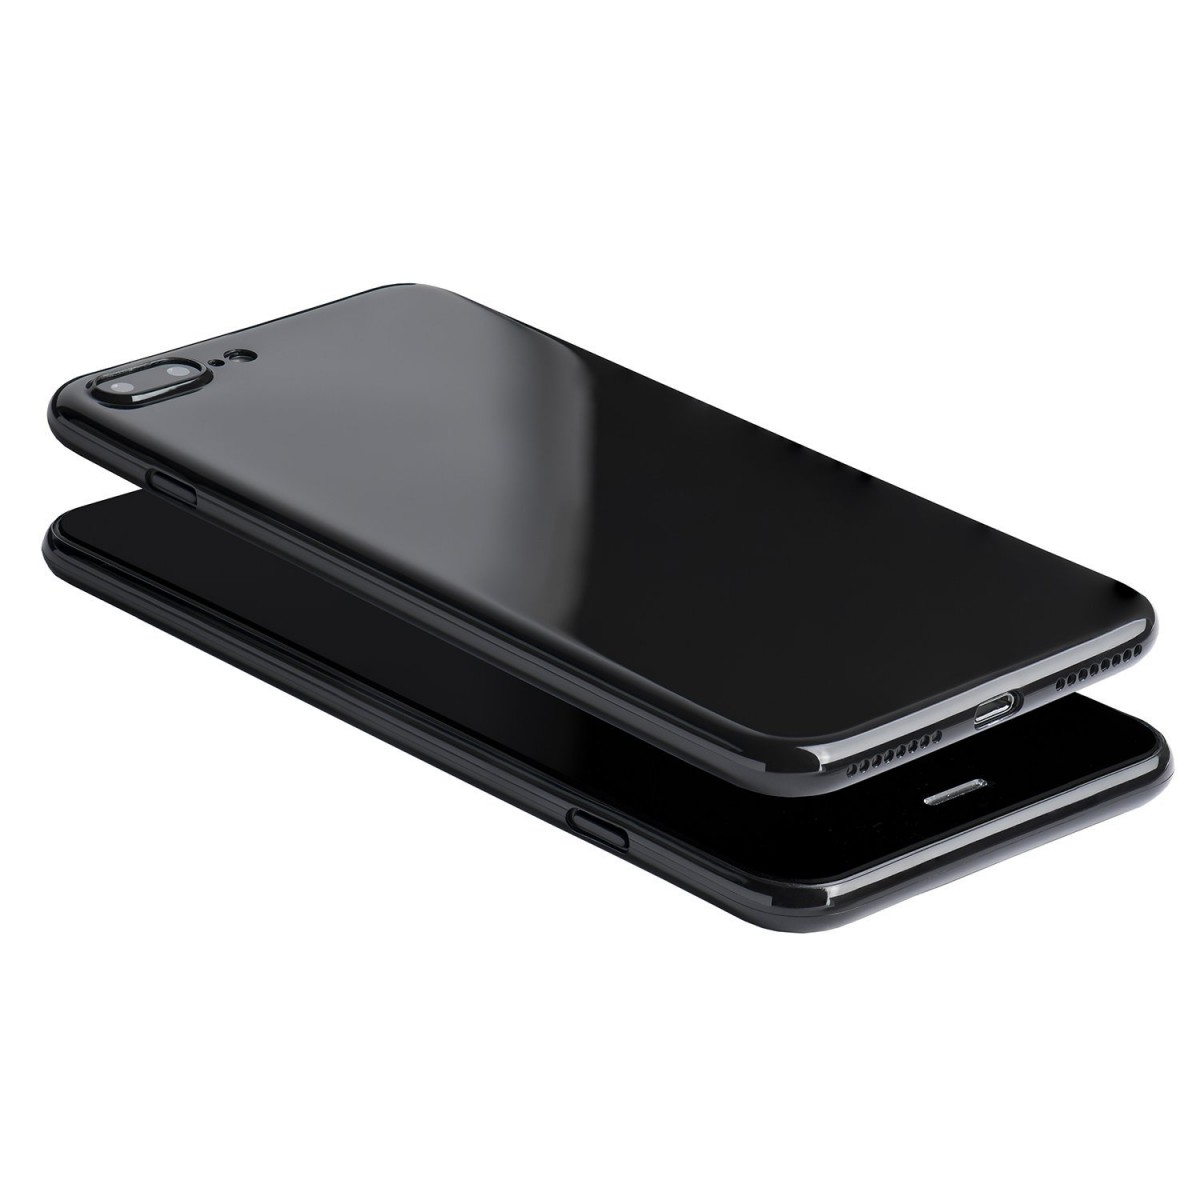 Obal Jet Black pro Apple iPhone 8 Plus / 7 Plus